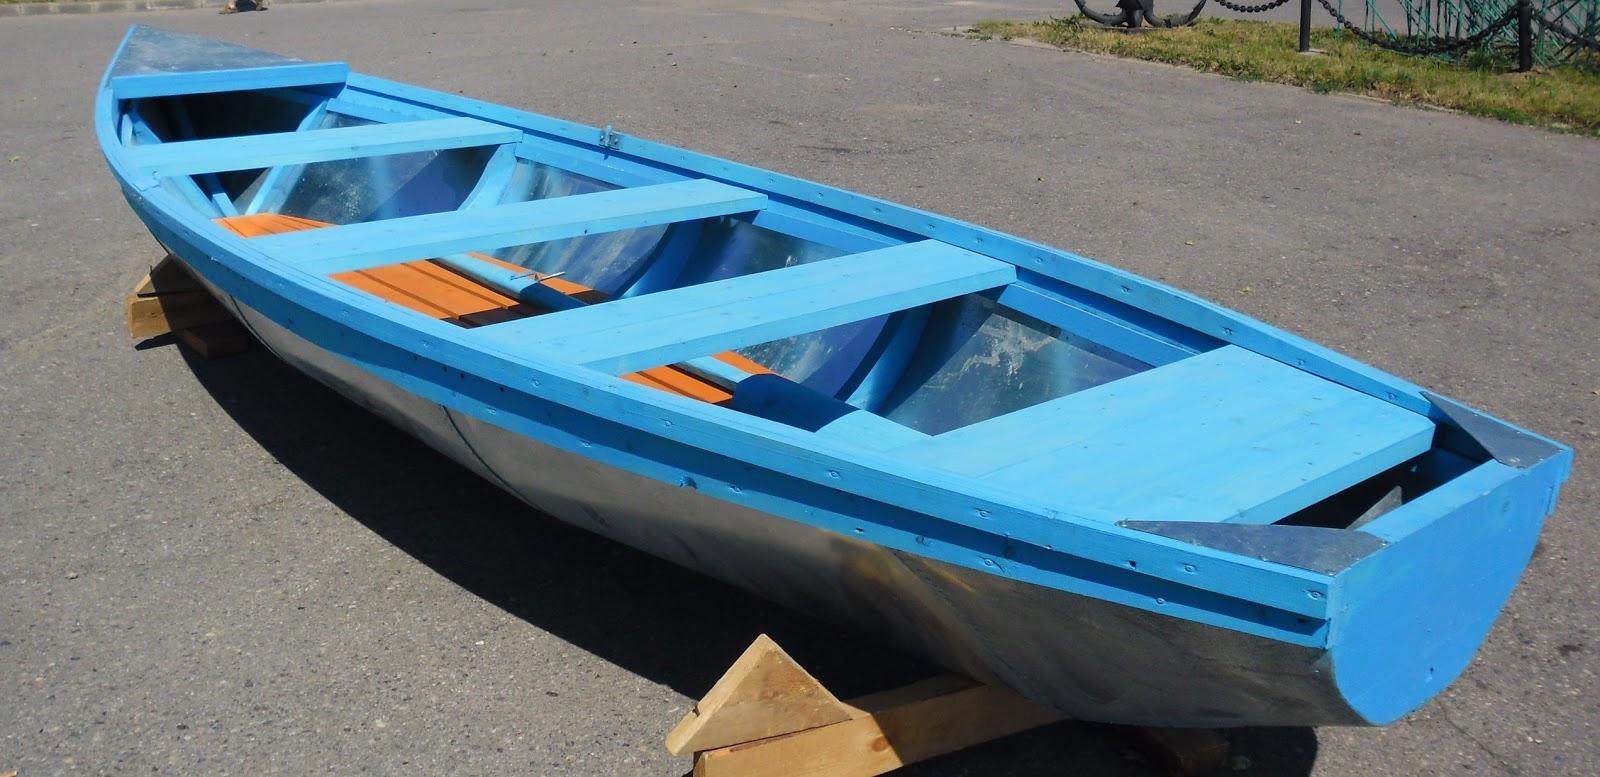 Моторная лодка своими руками из оцинковки 54